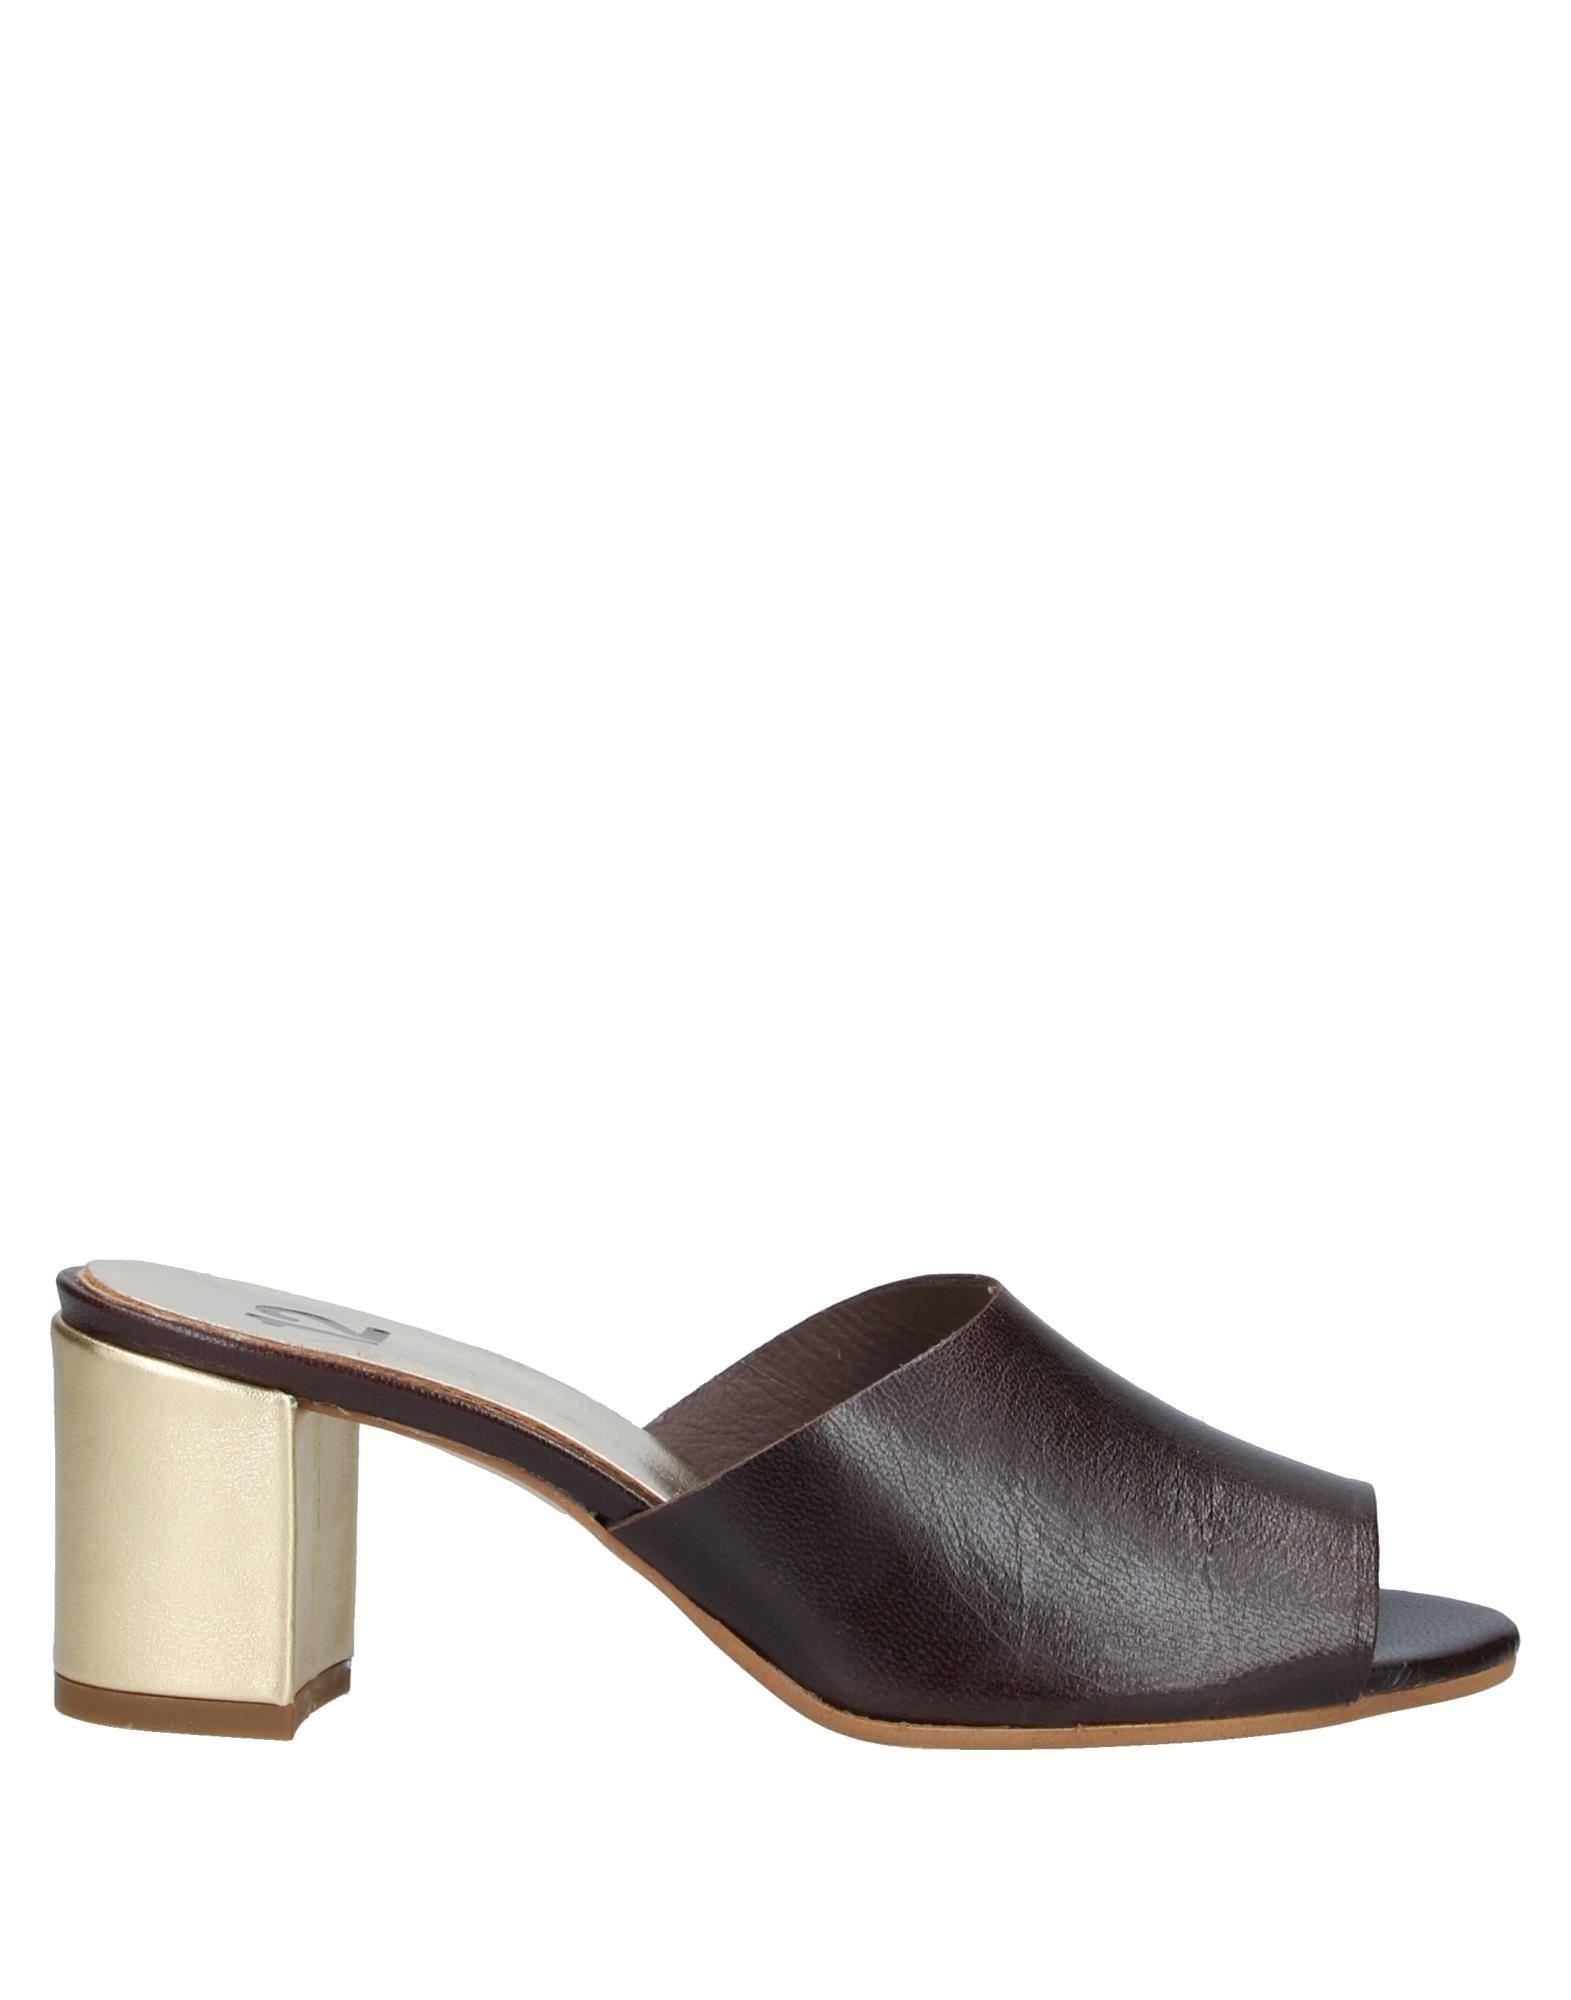 TSD12 Sandals - Item 11770872